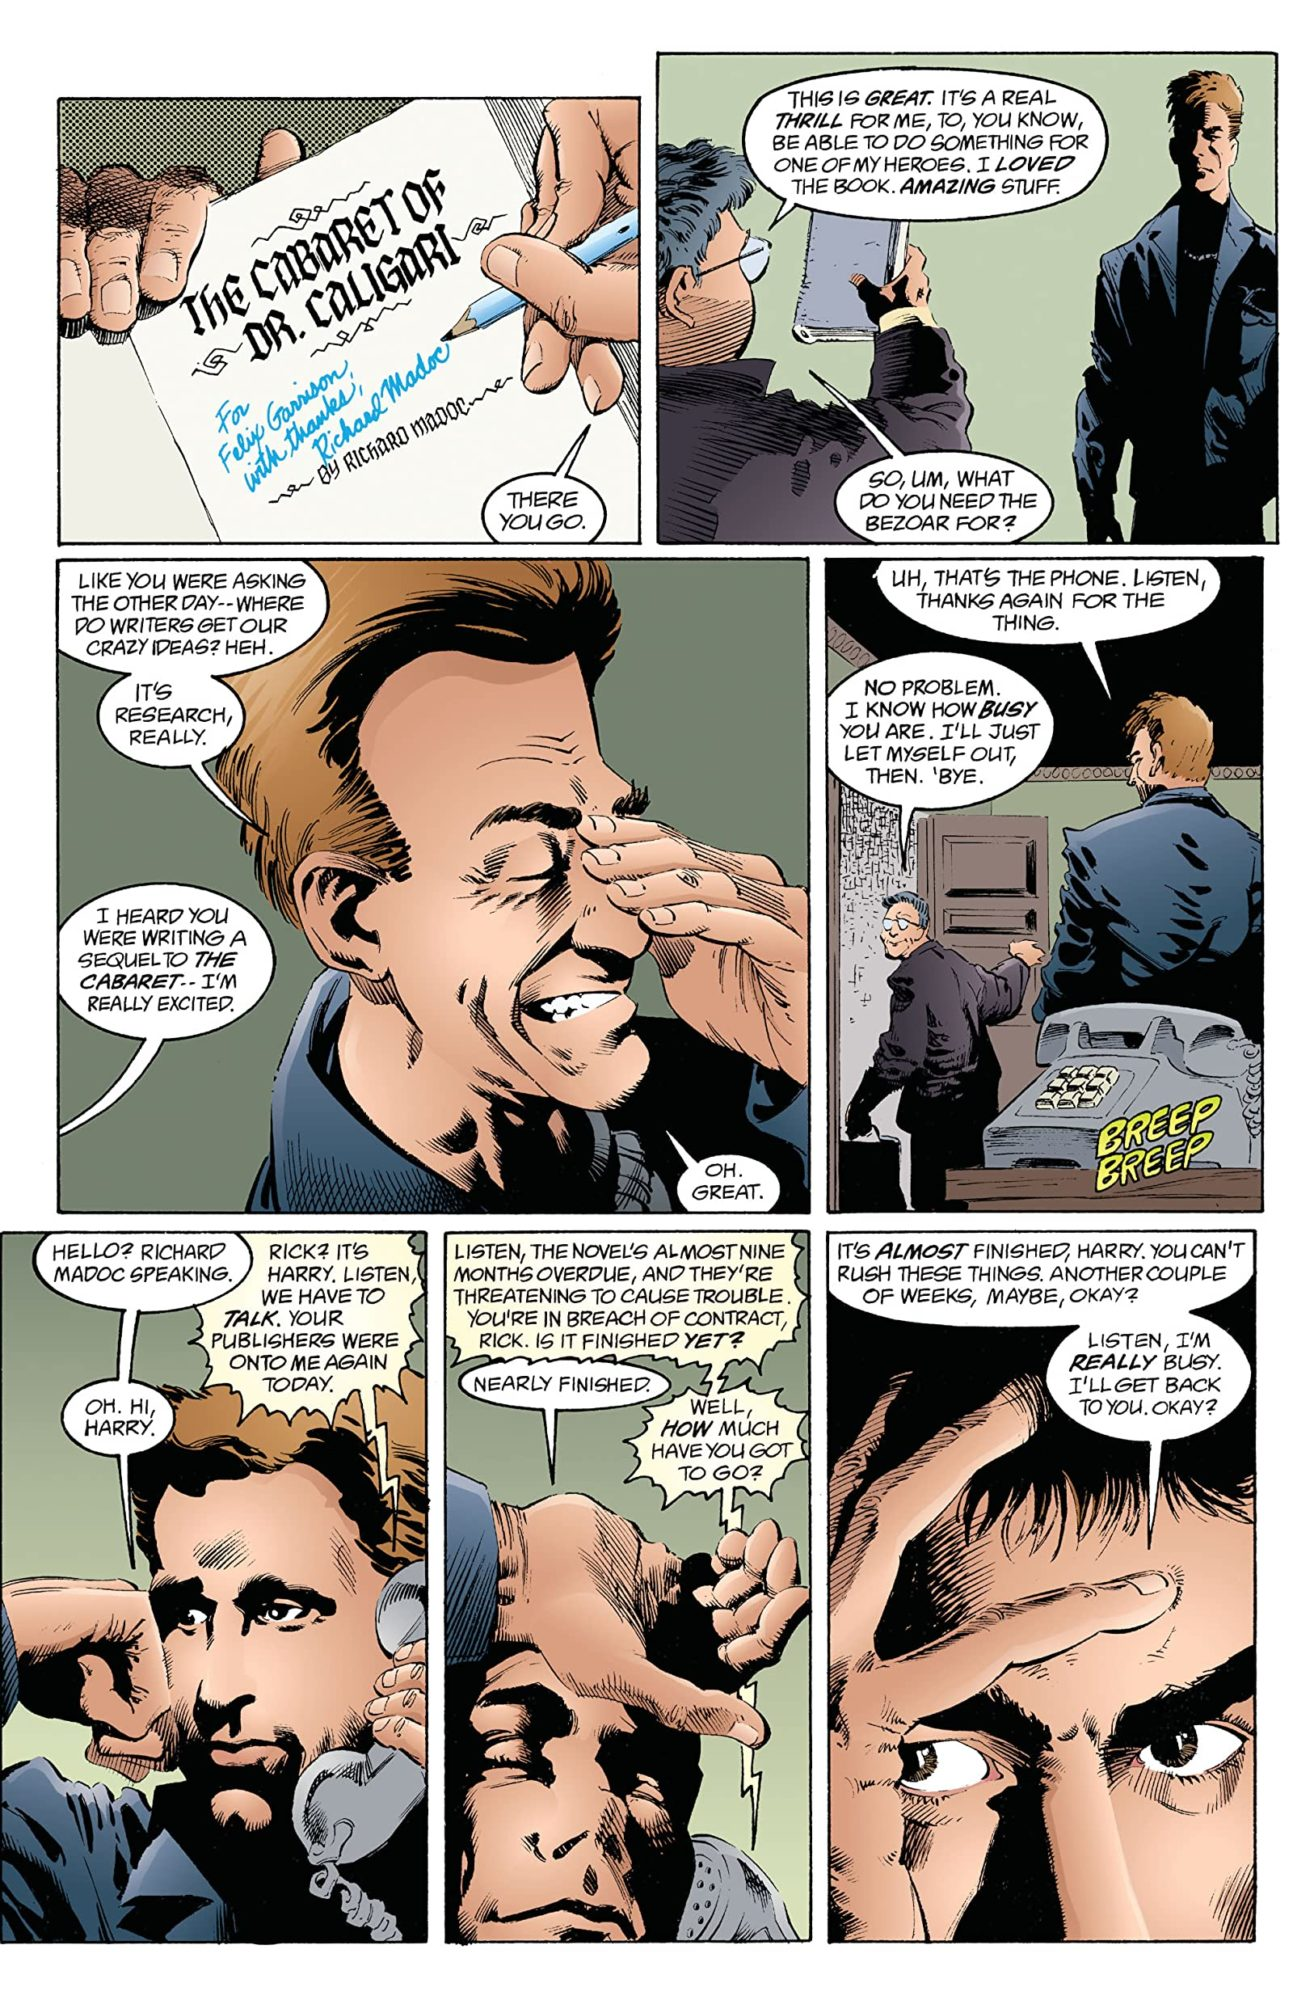 The Sandman Dream Country by Neil Gaiman - Calliope